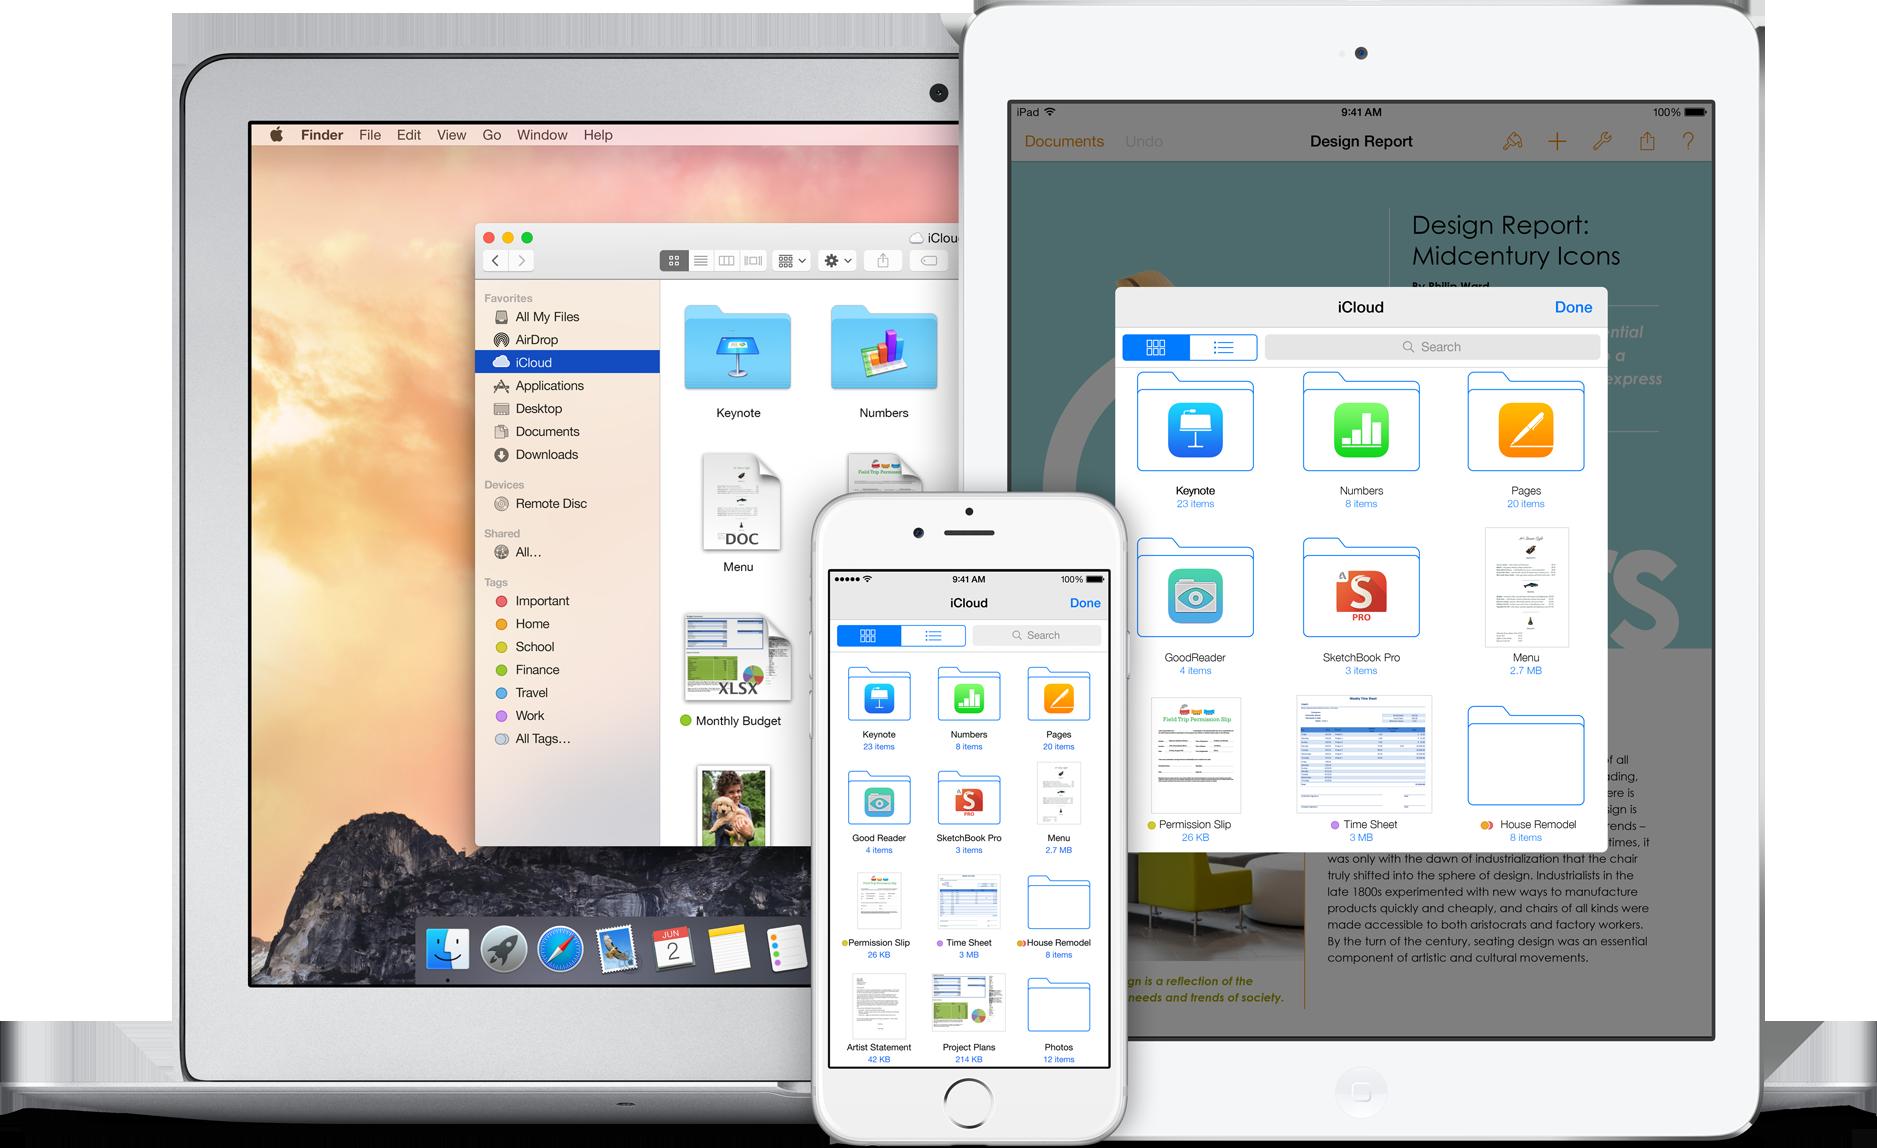 iCloud Drive on Mac, iPad and iPhone